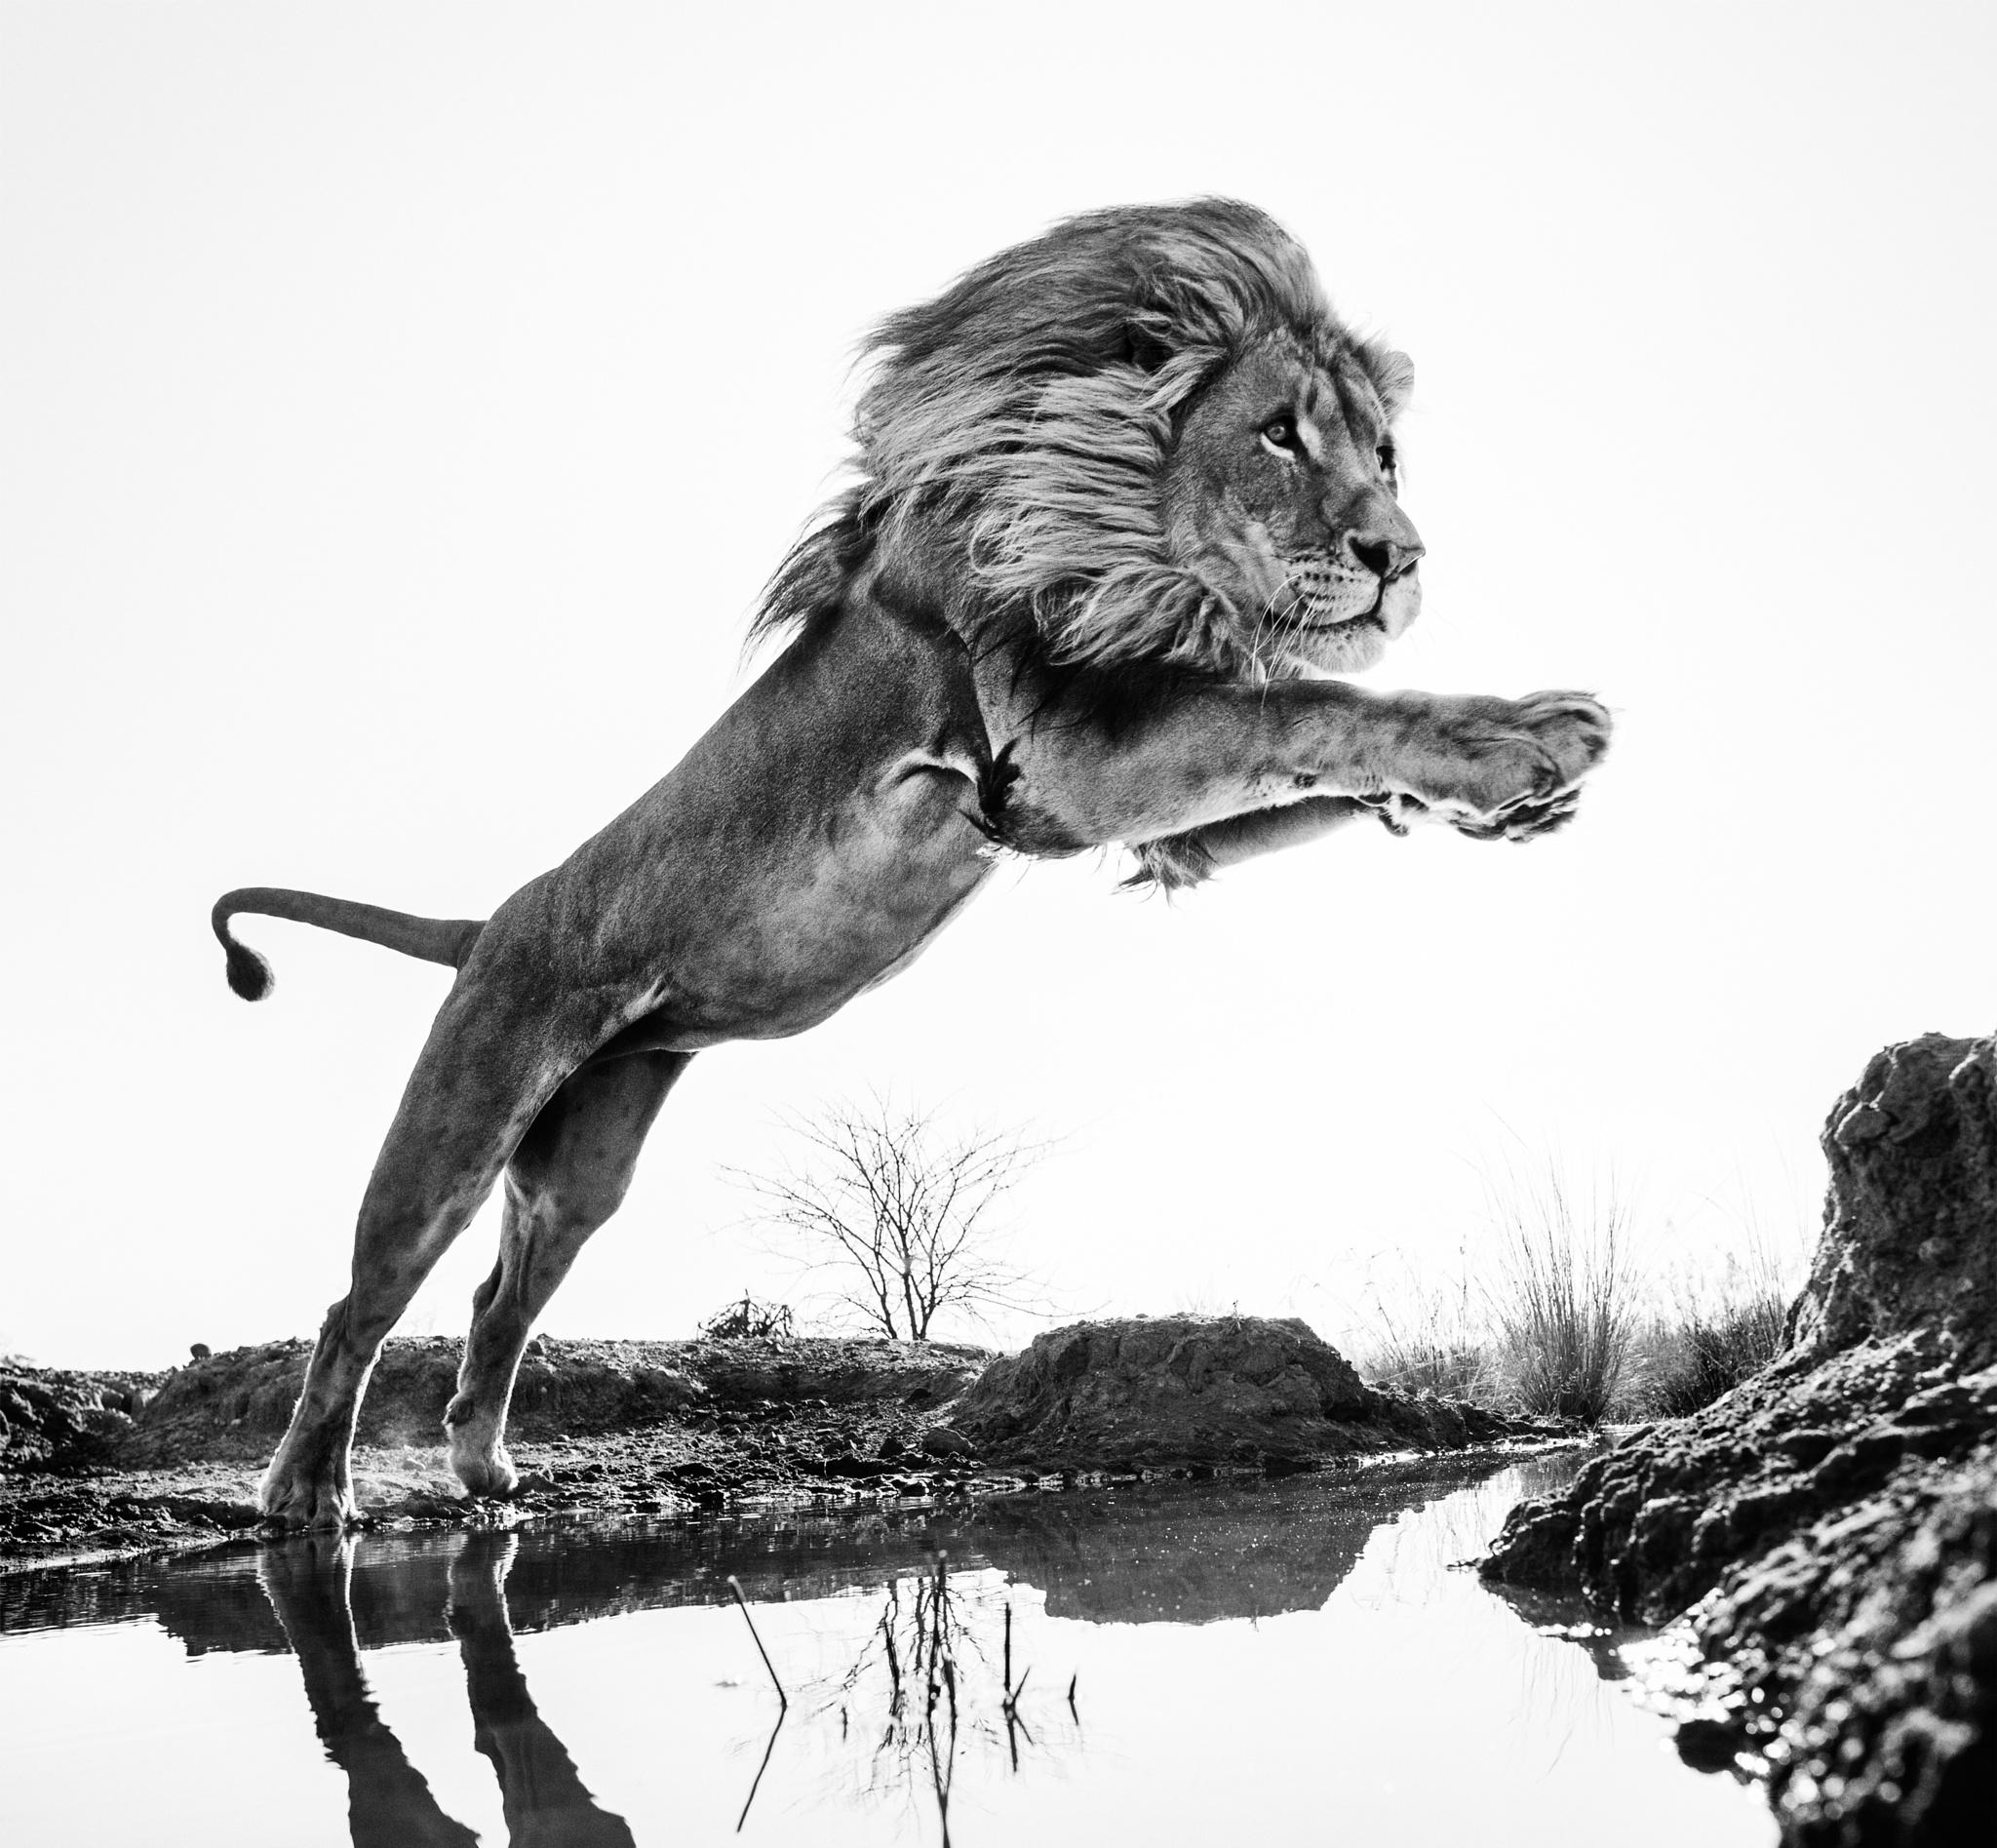 Lion King by davidyarrow